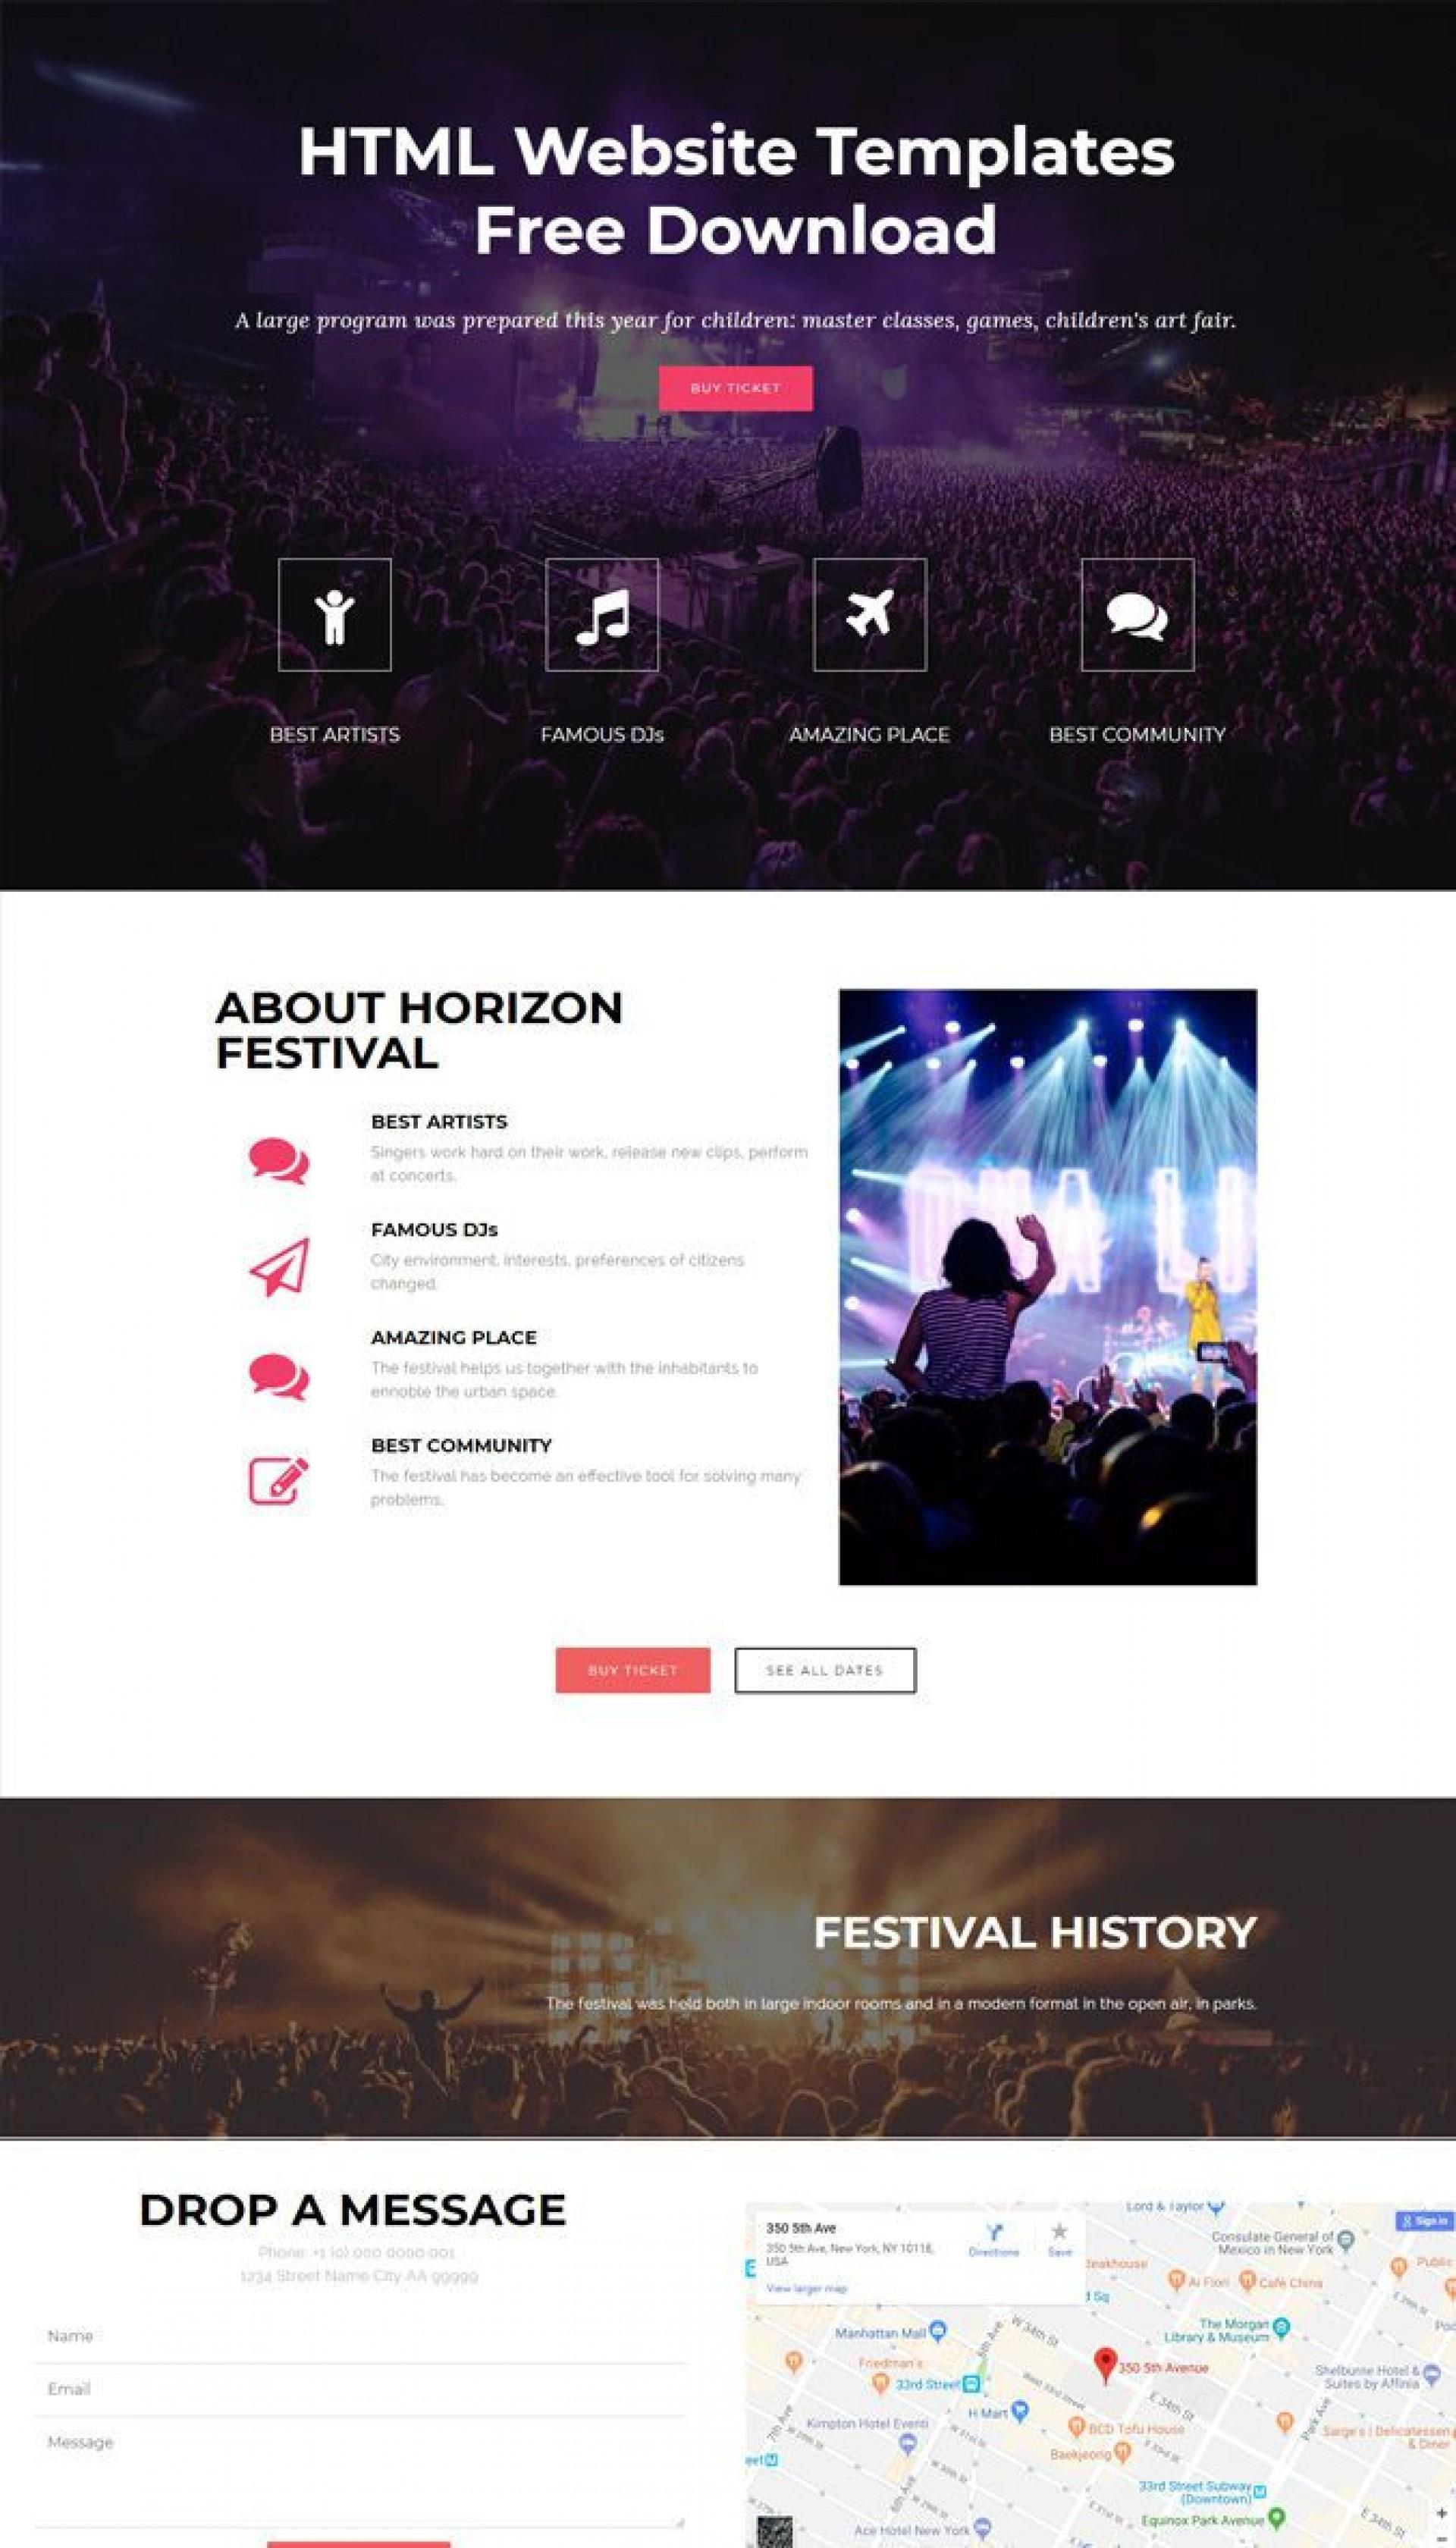 003 Dreaded Website Design Template Free High Resolution  Asp.net Web Download Psd1920